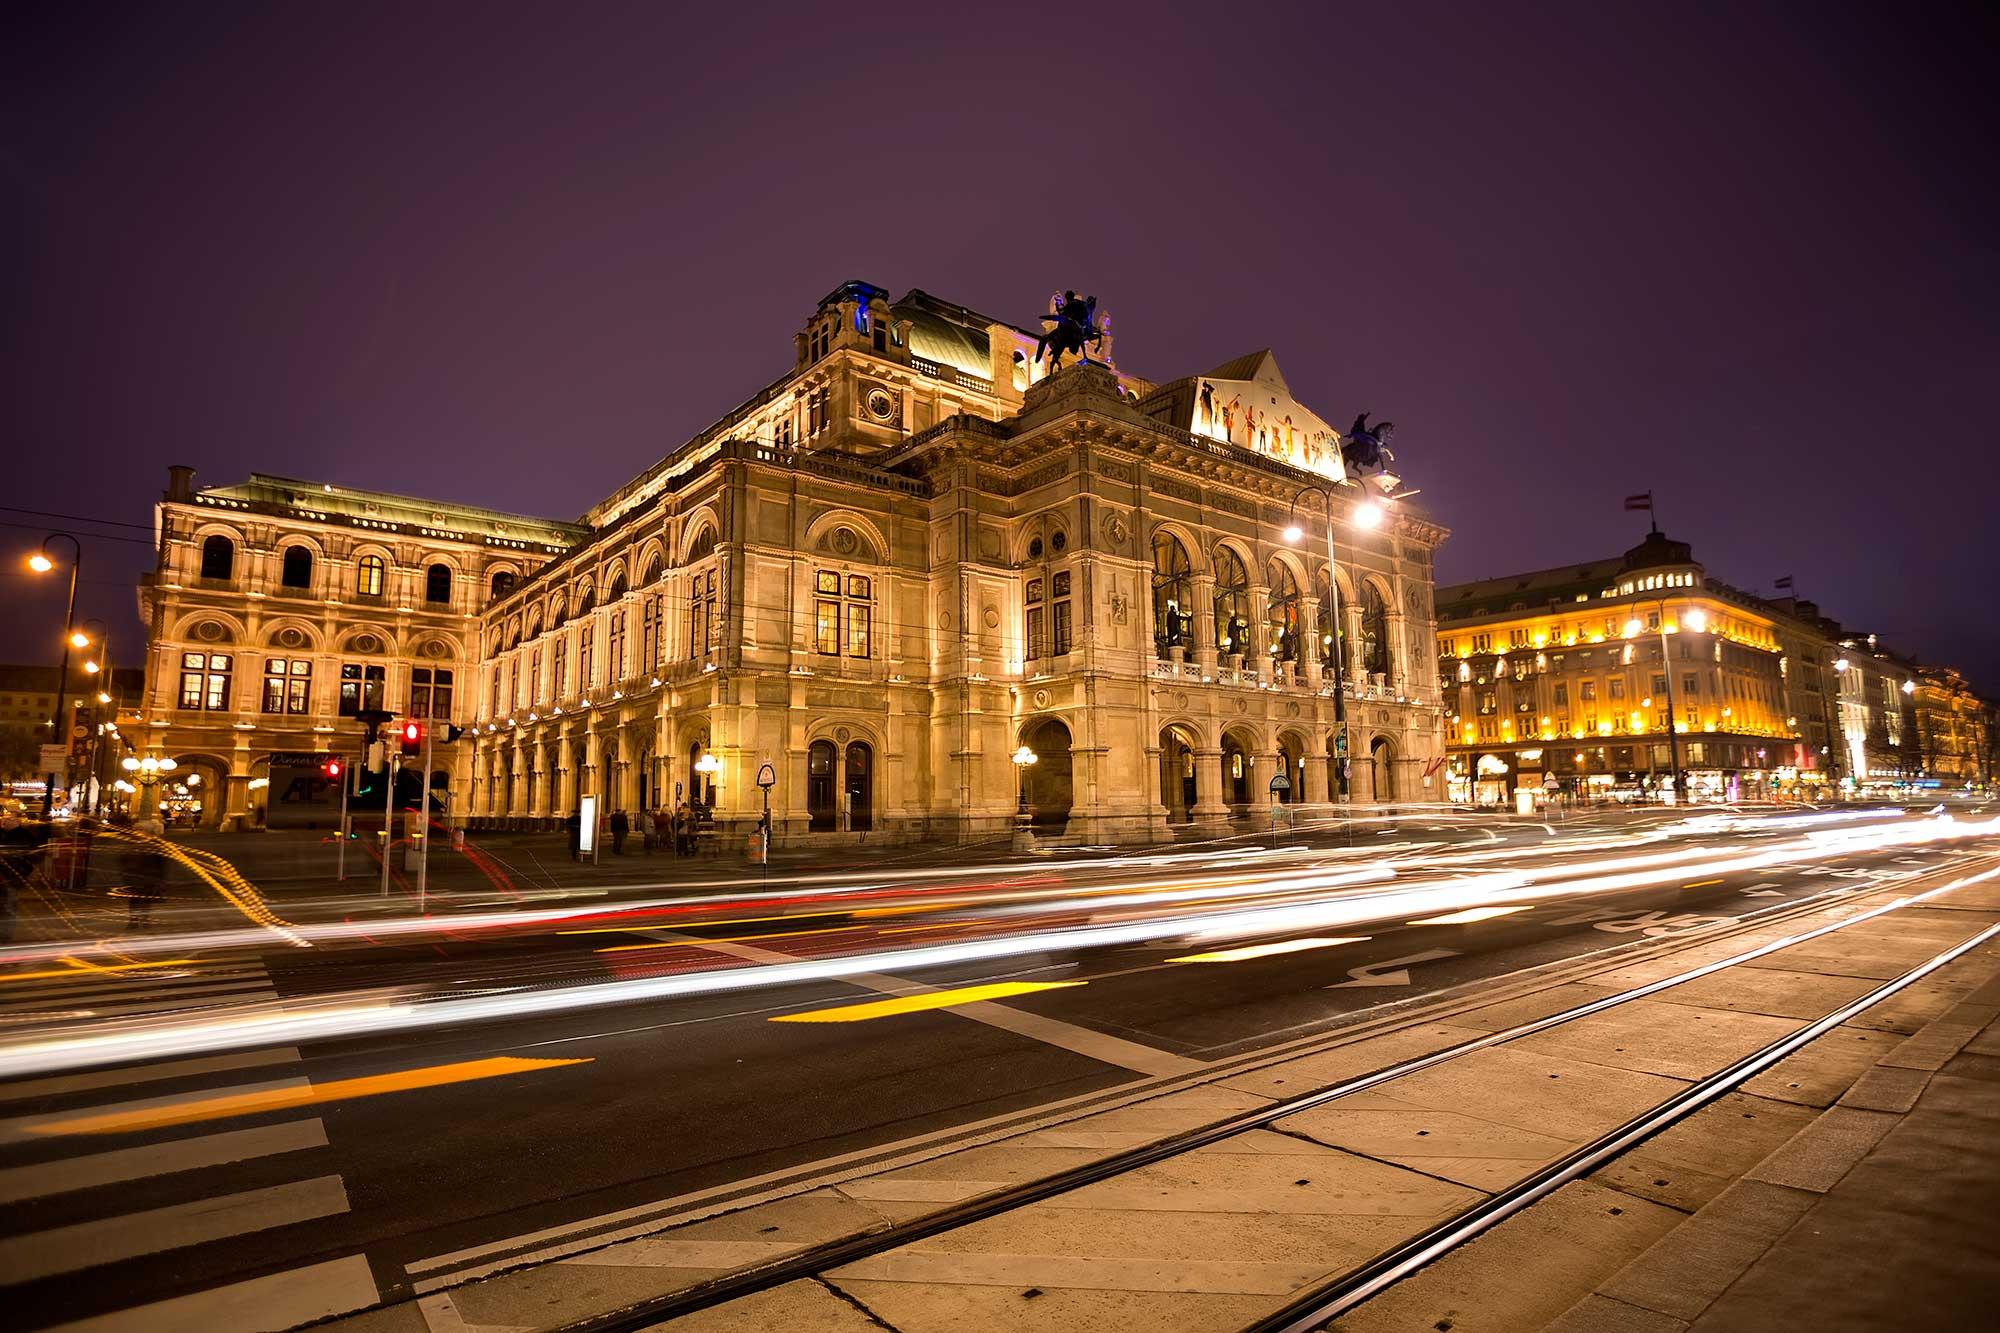 Bester Internetanbieter Wien